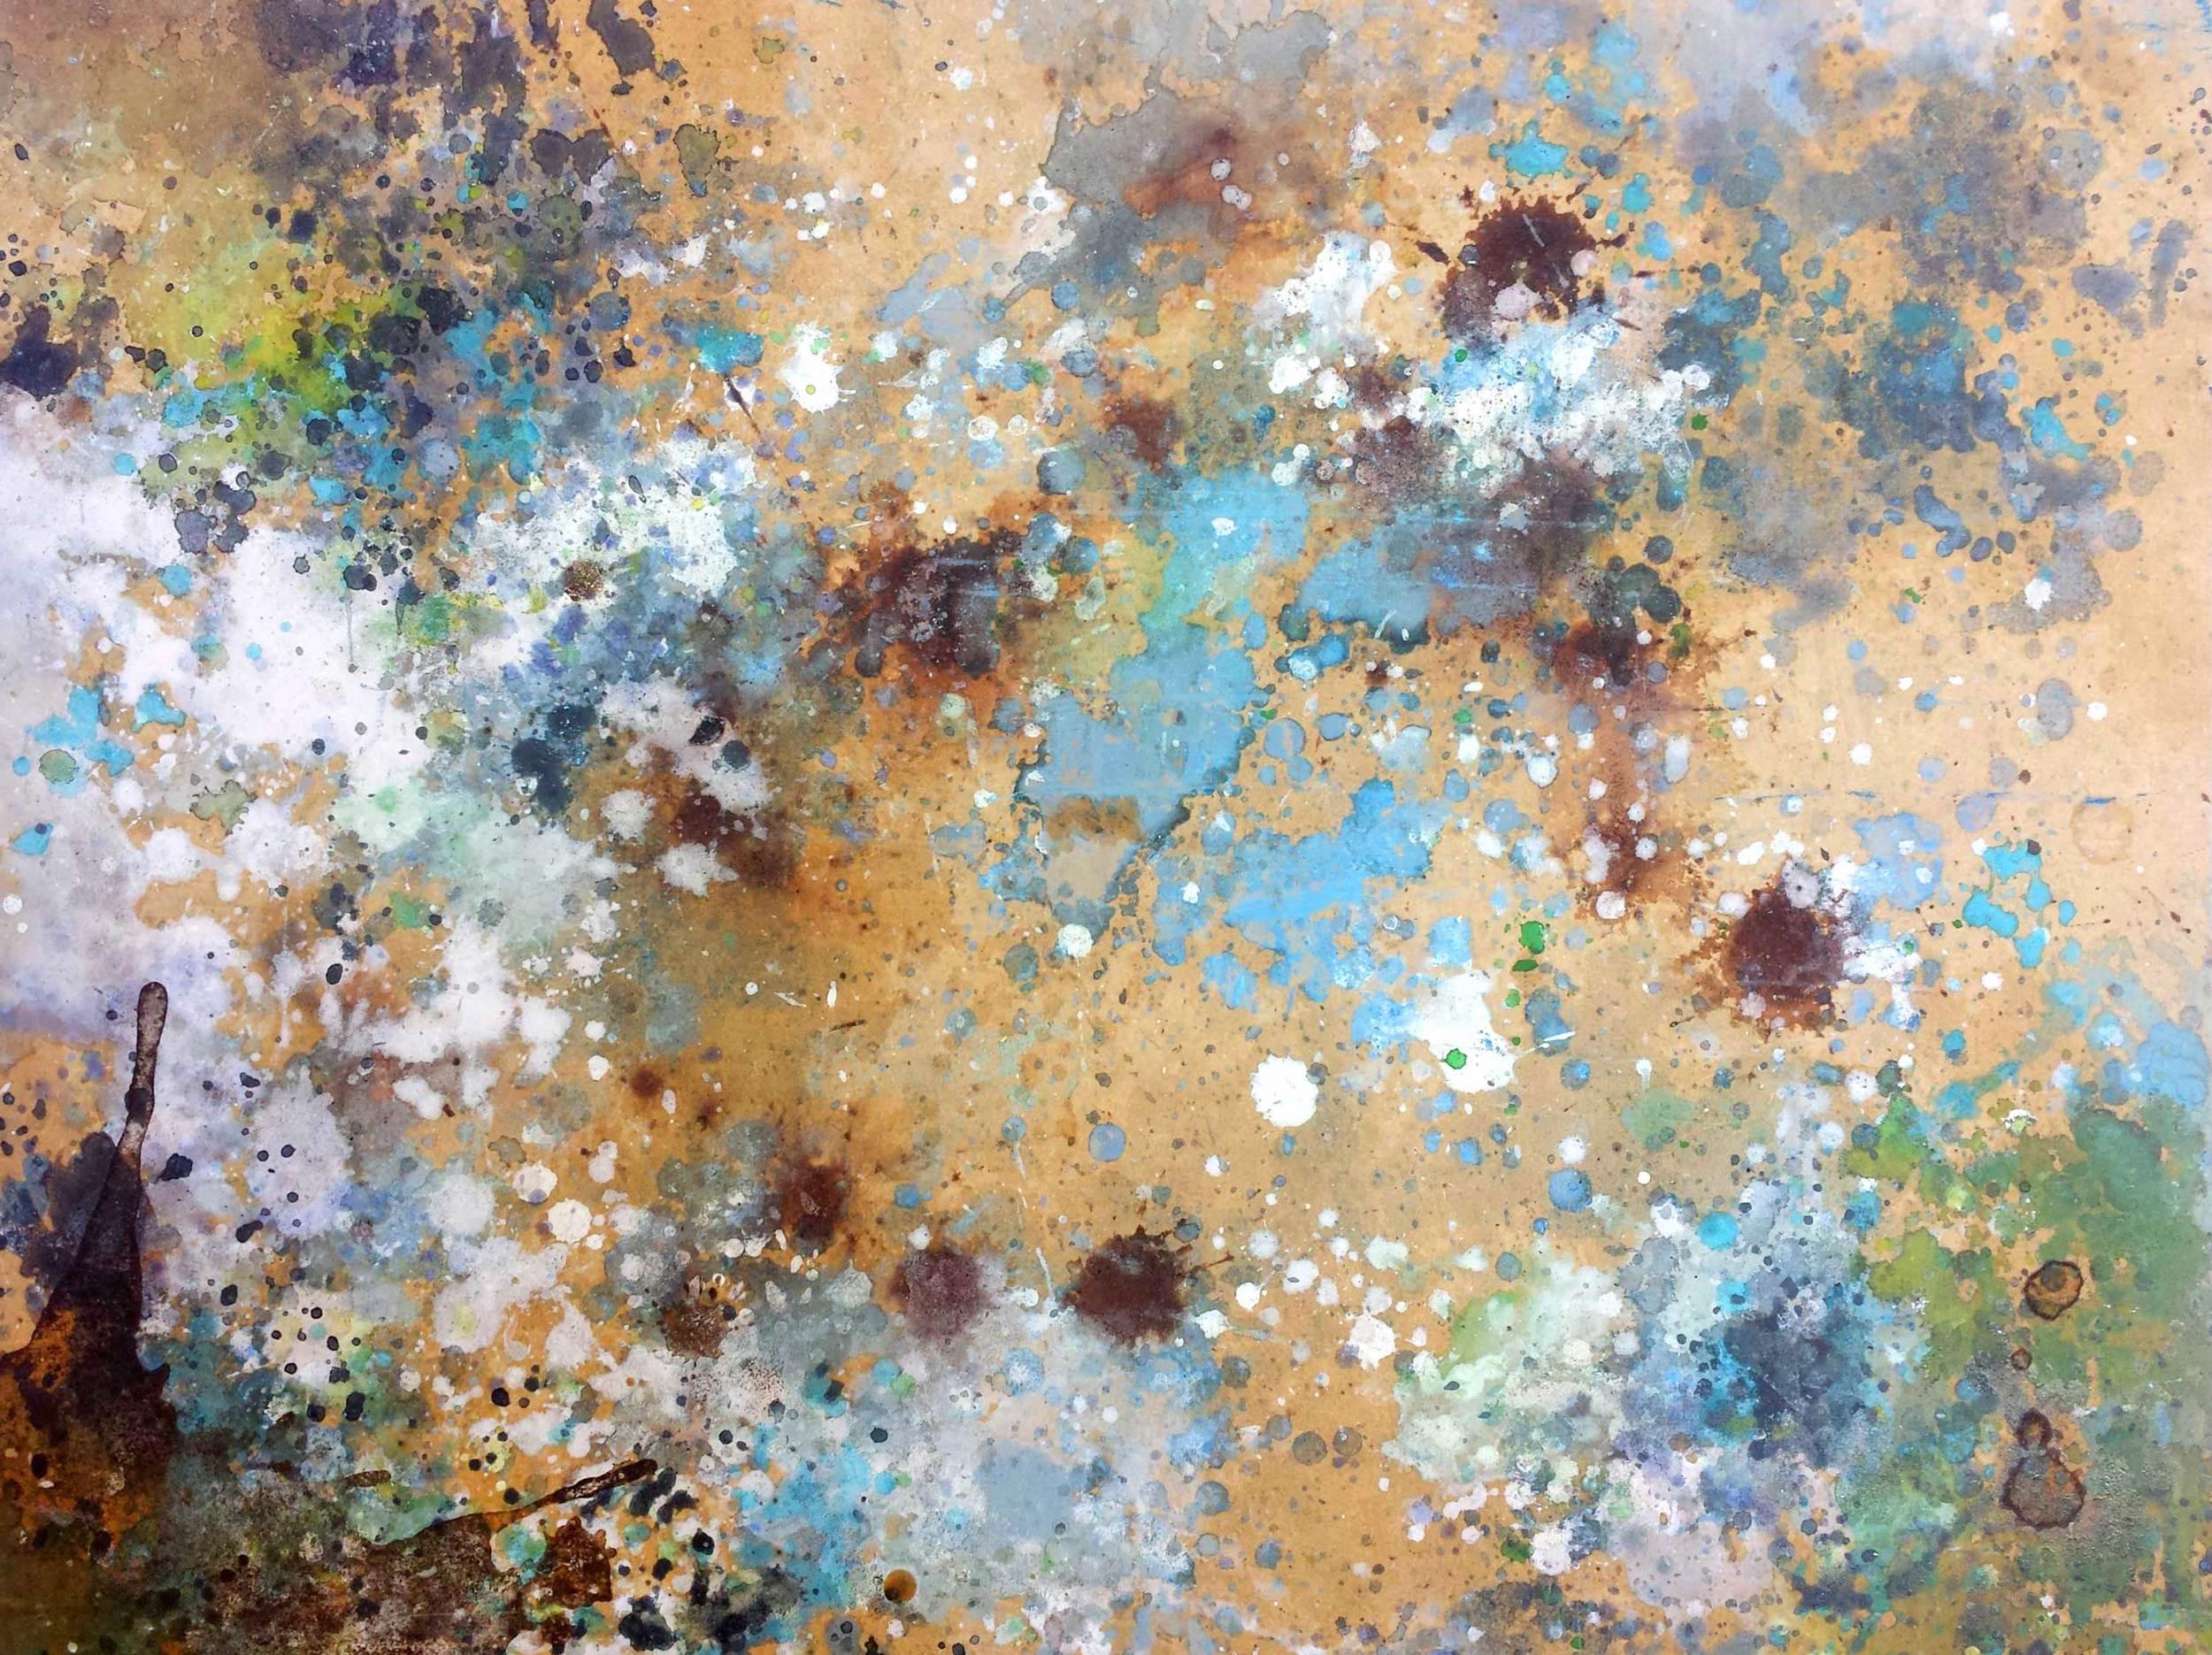 paulapart-map-painting-nebula.jpg